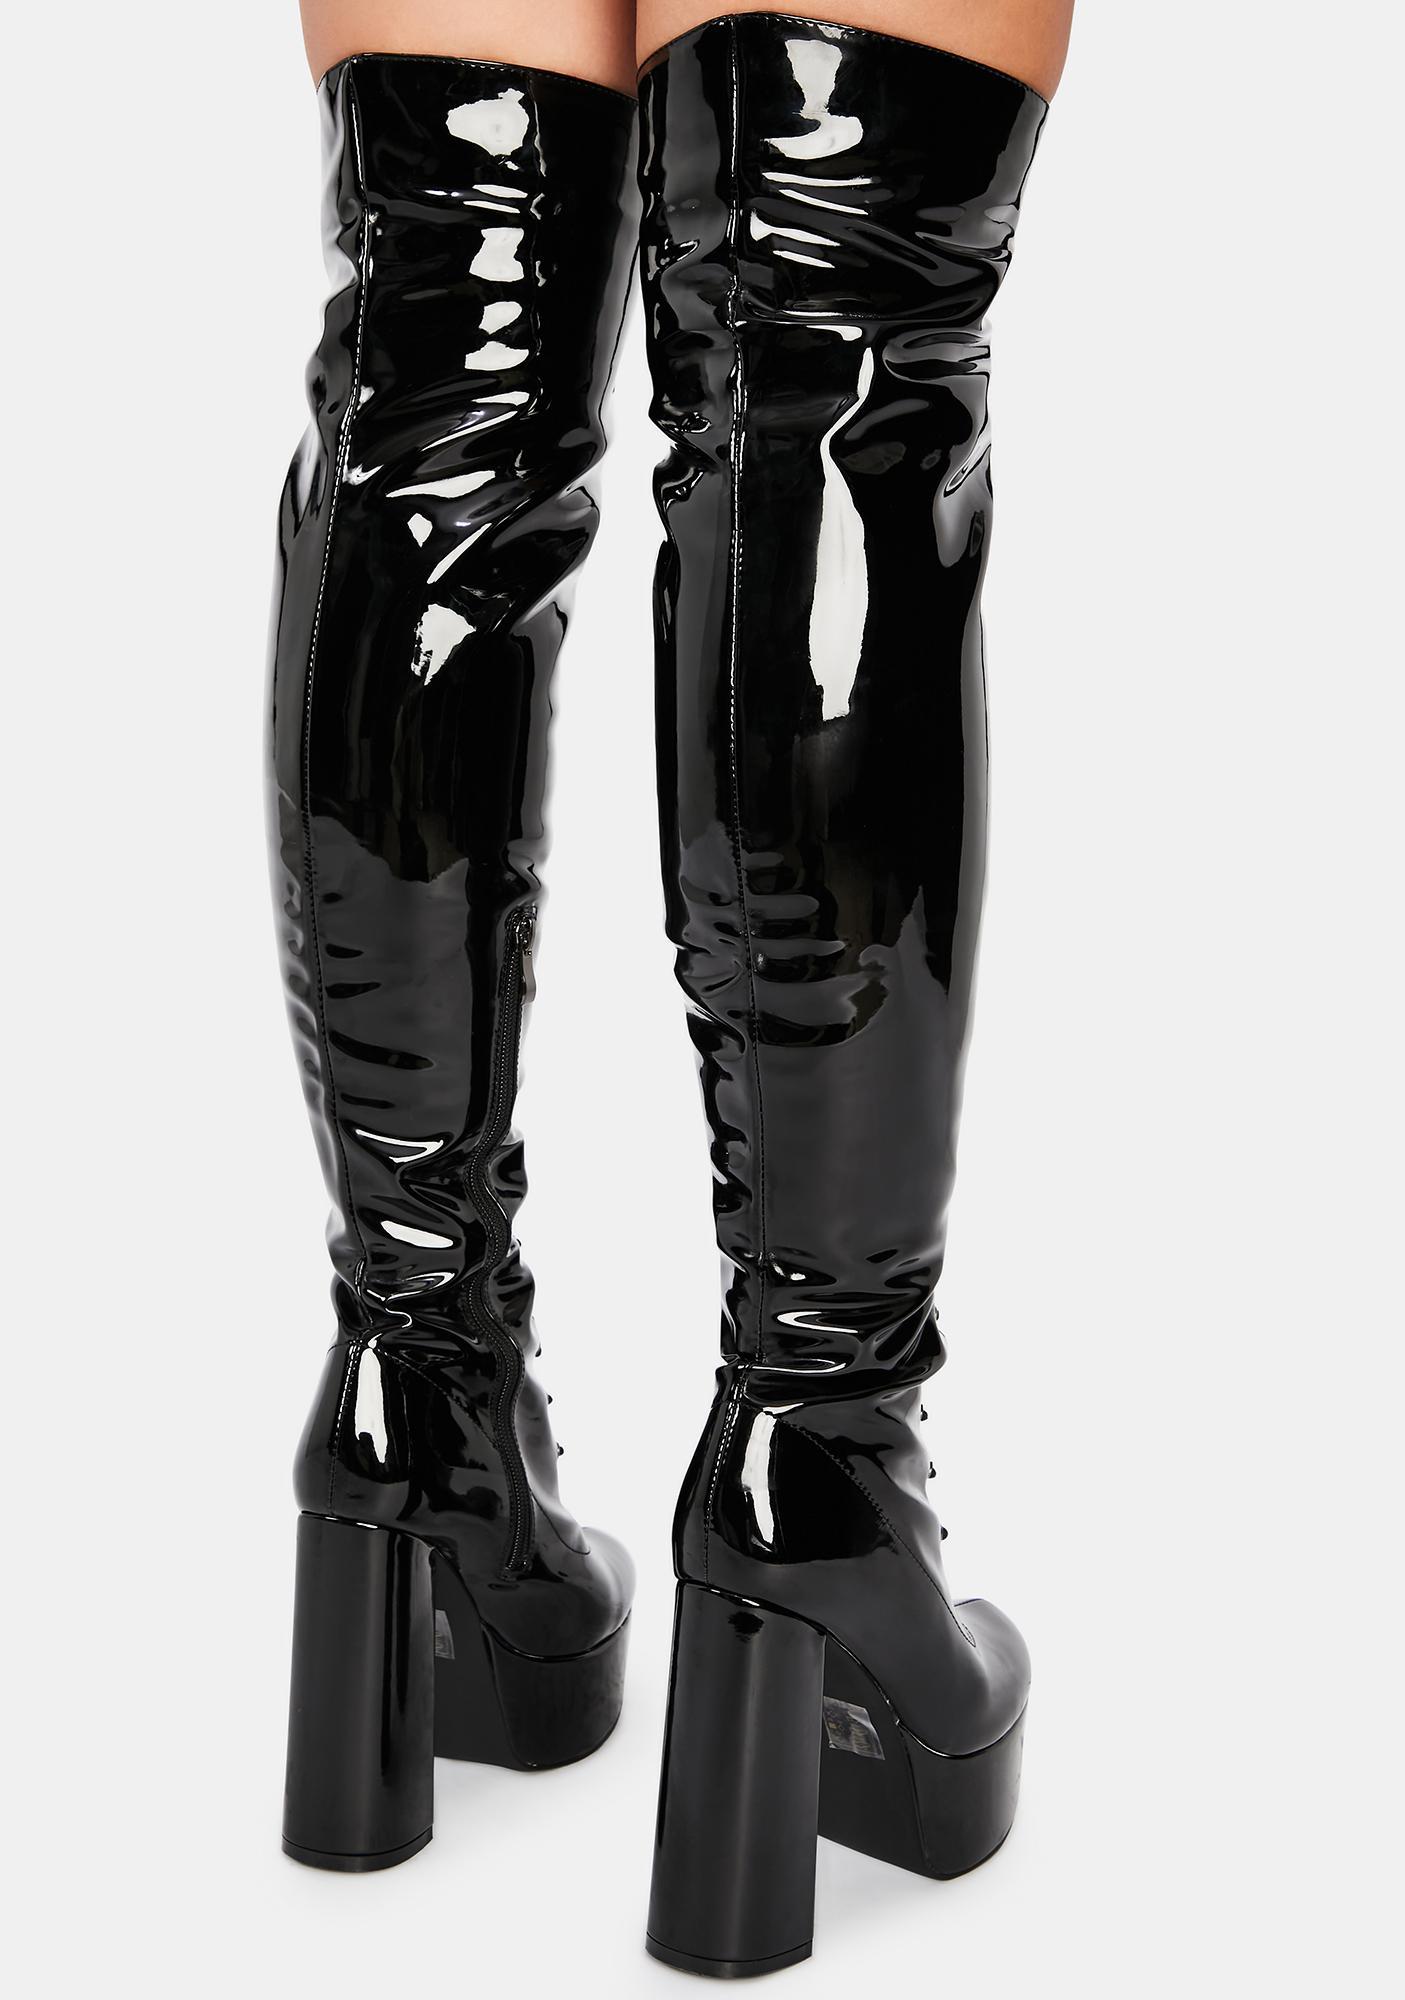 AZALEA WANG Philly Thigh High Boots